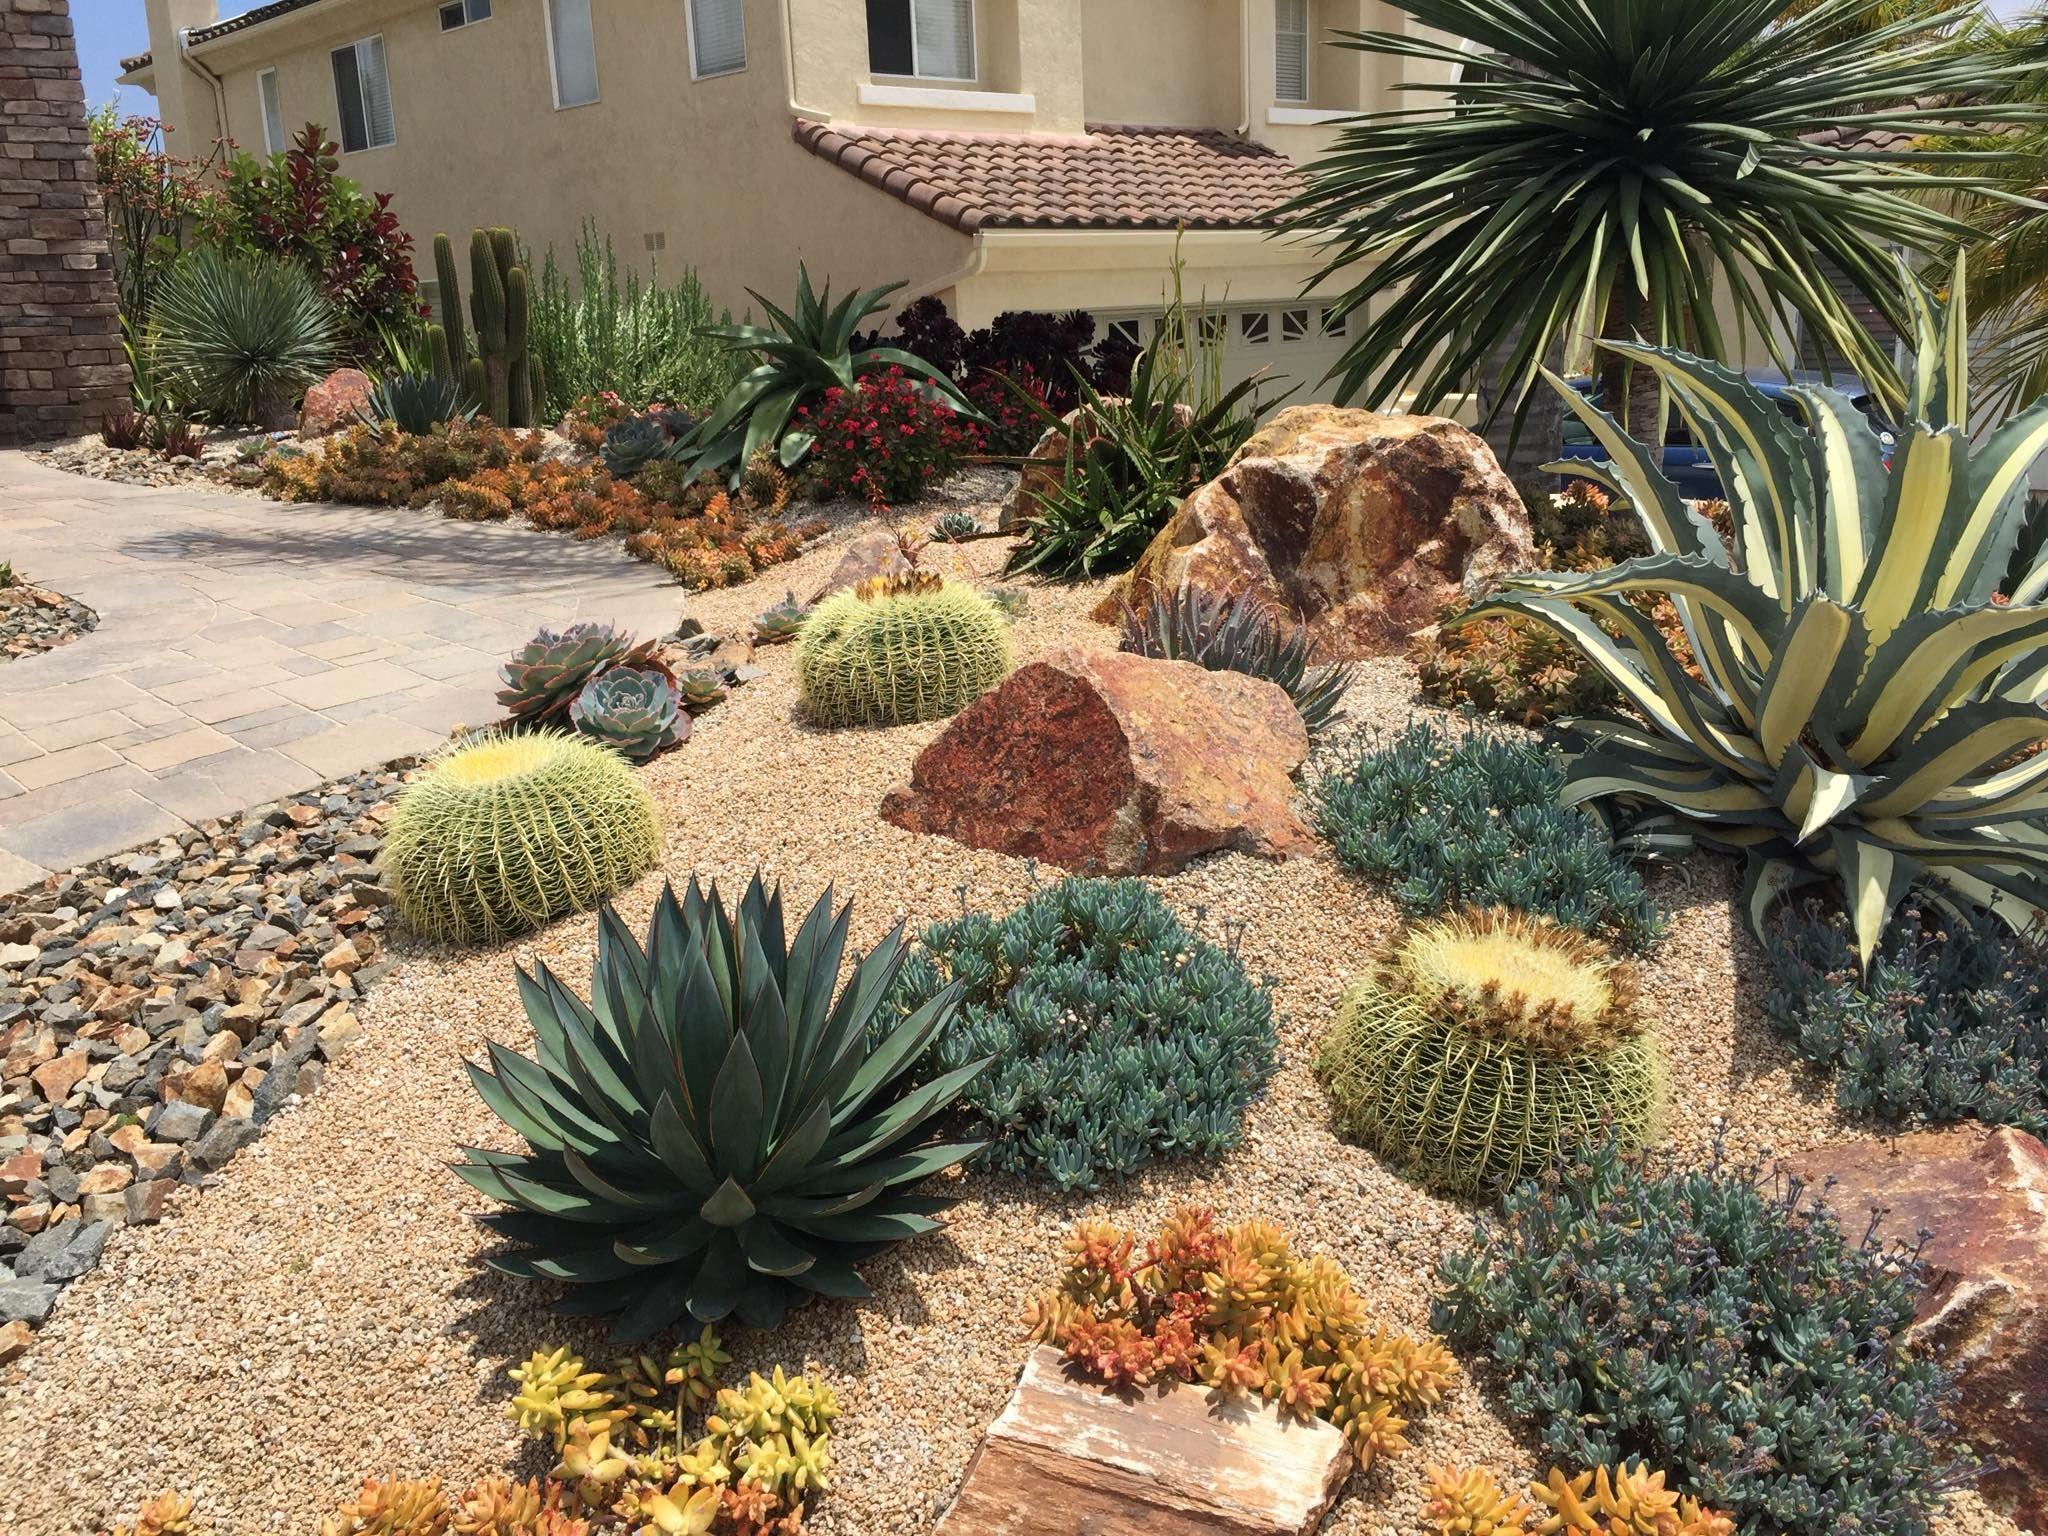 Succulent garden of Chris Gleason in San Diego